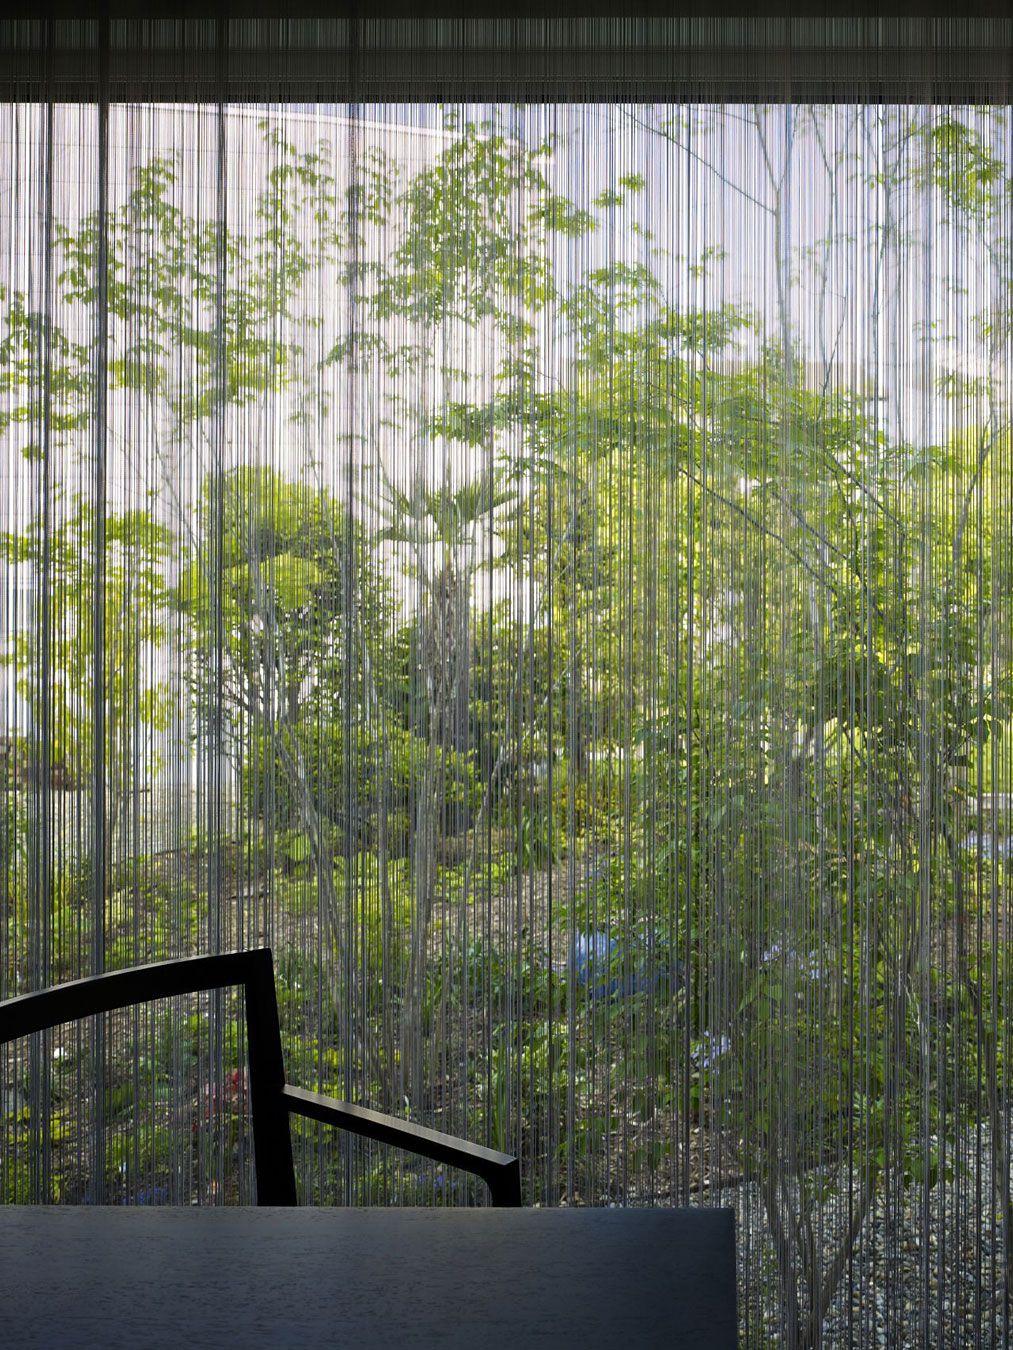 Bamboo house window design  minimalist house window design ideas  awesome home decor  interior